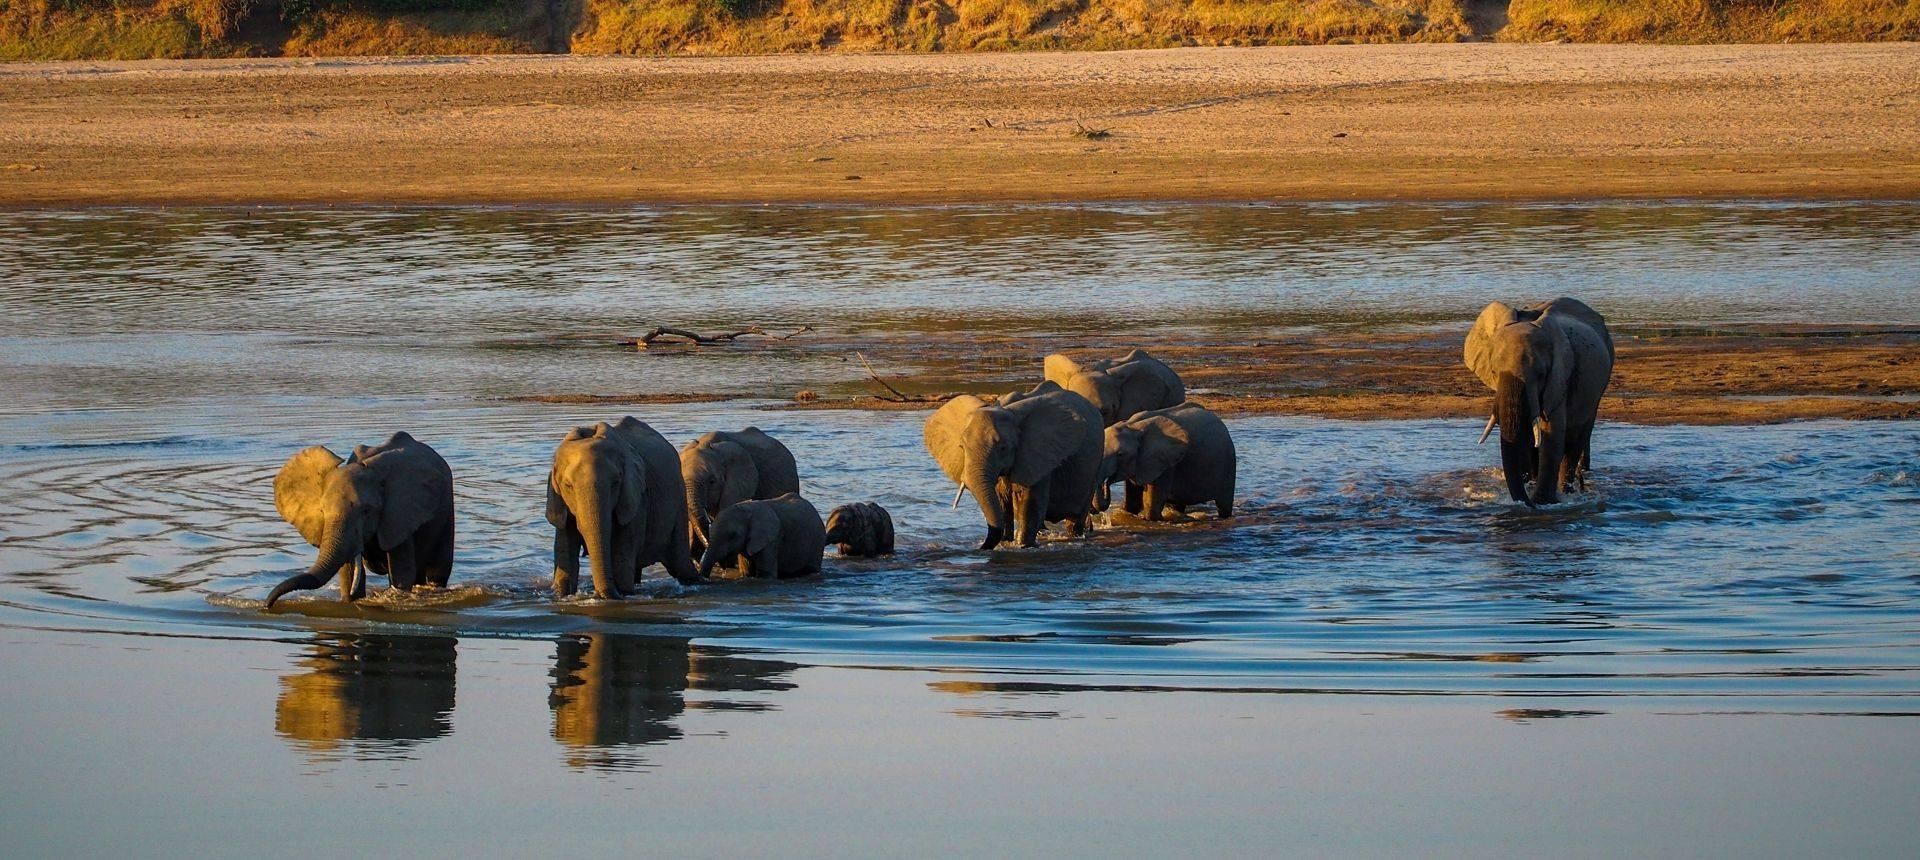 Elephants, South Luangwa, Zambia Shutterstock 570715432